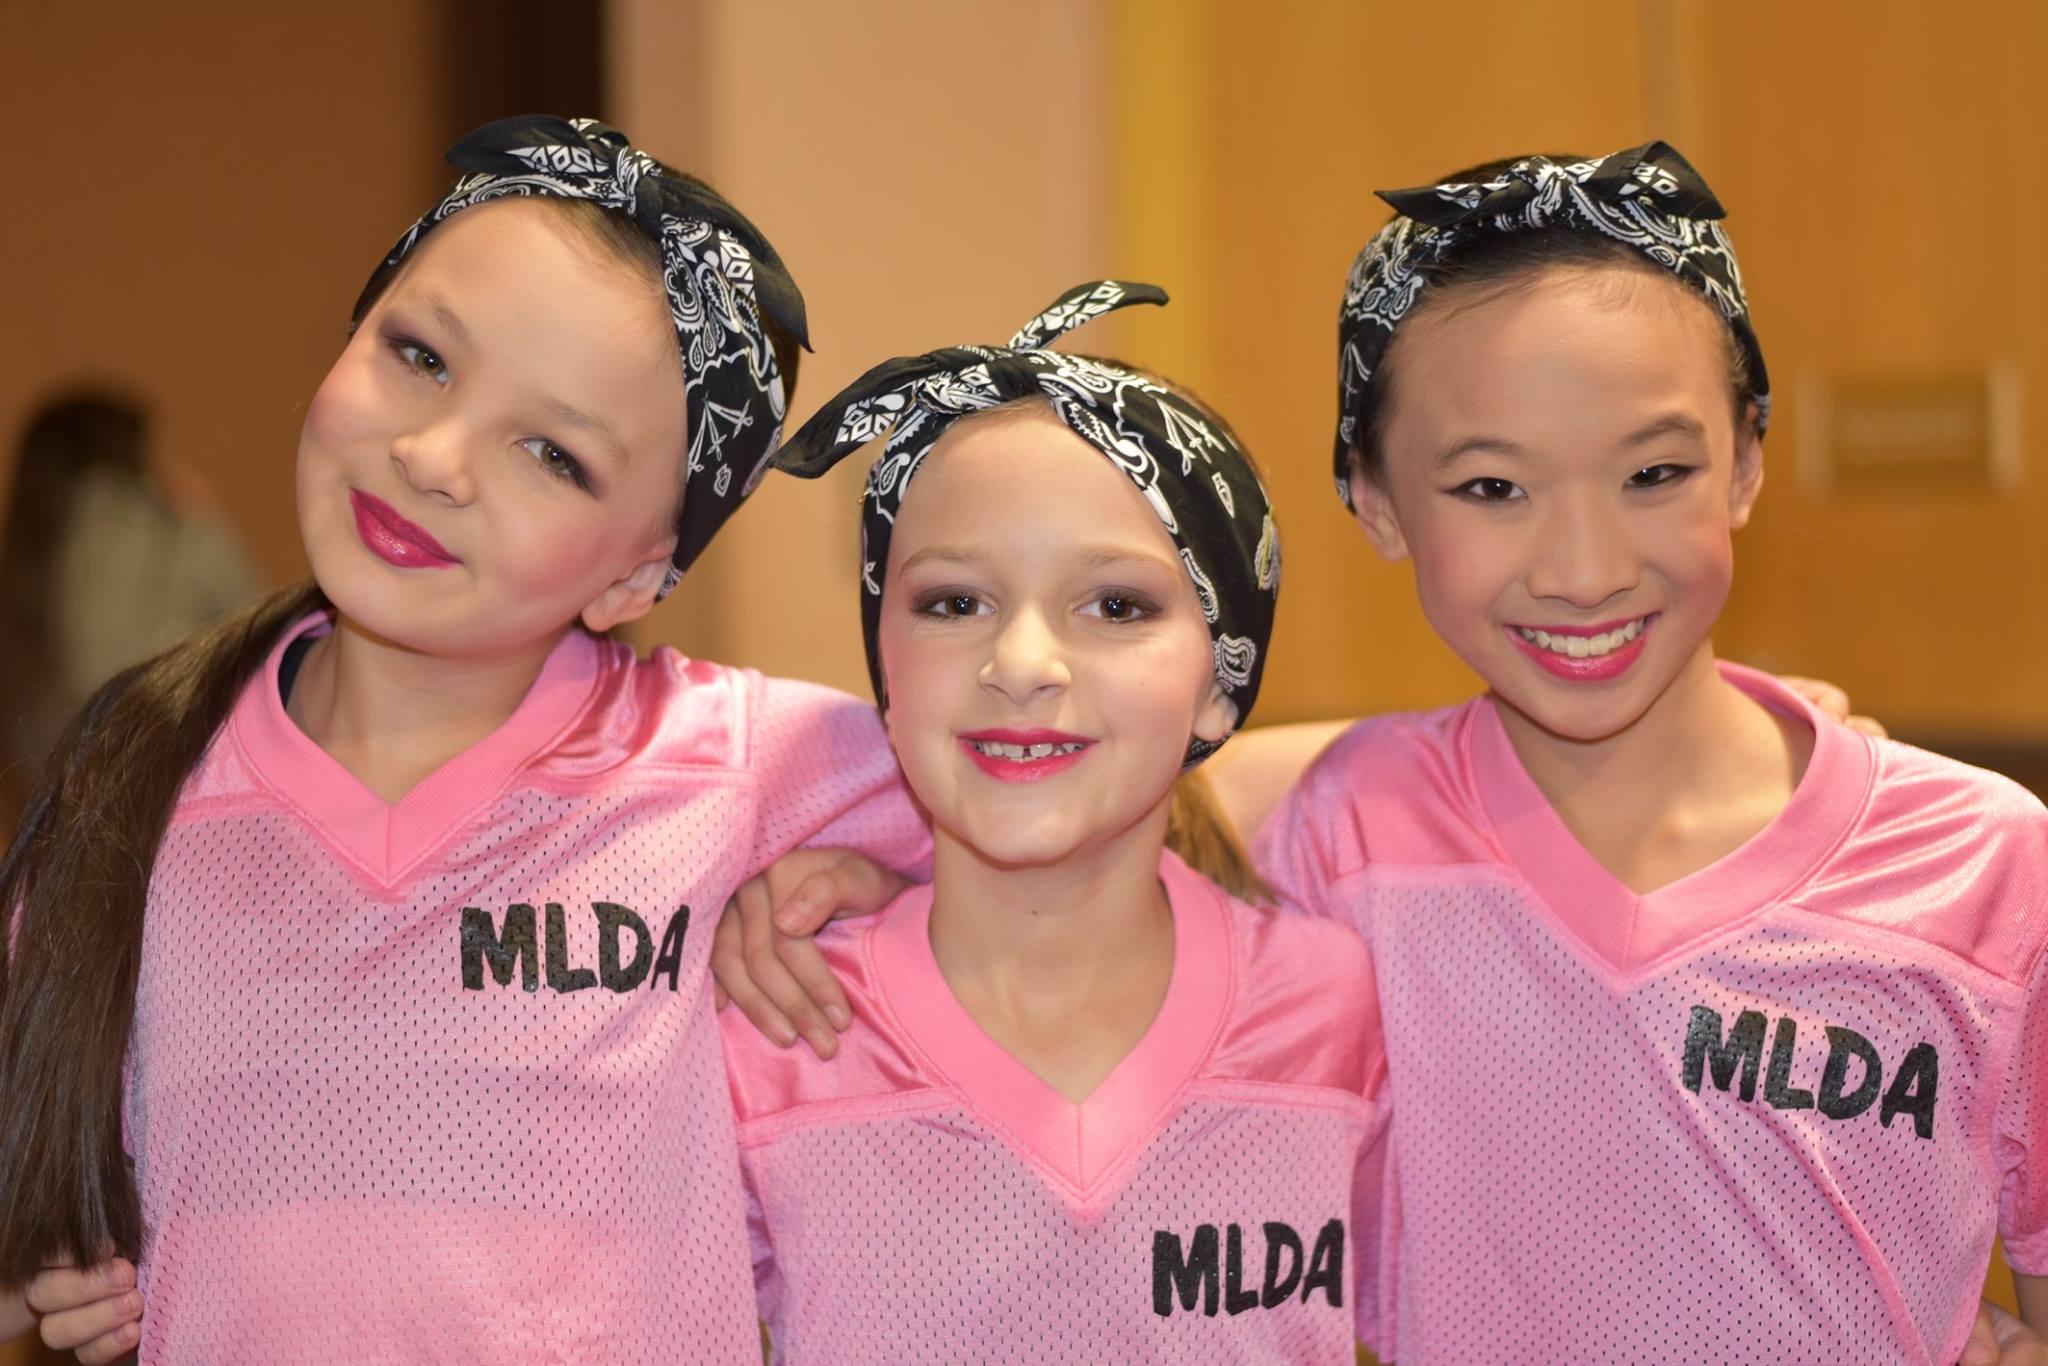 MLDA Squad